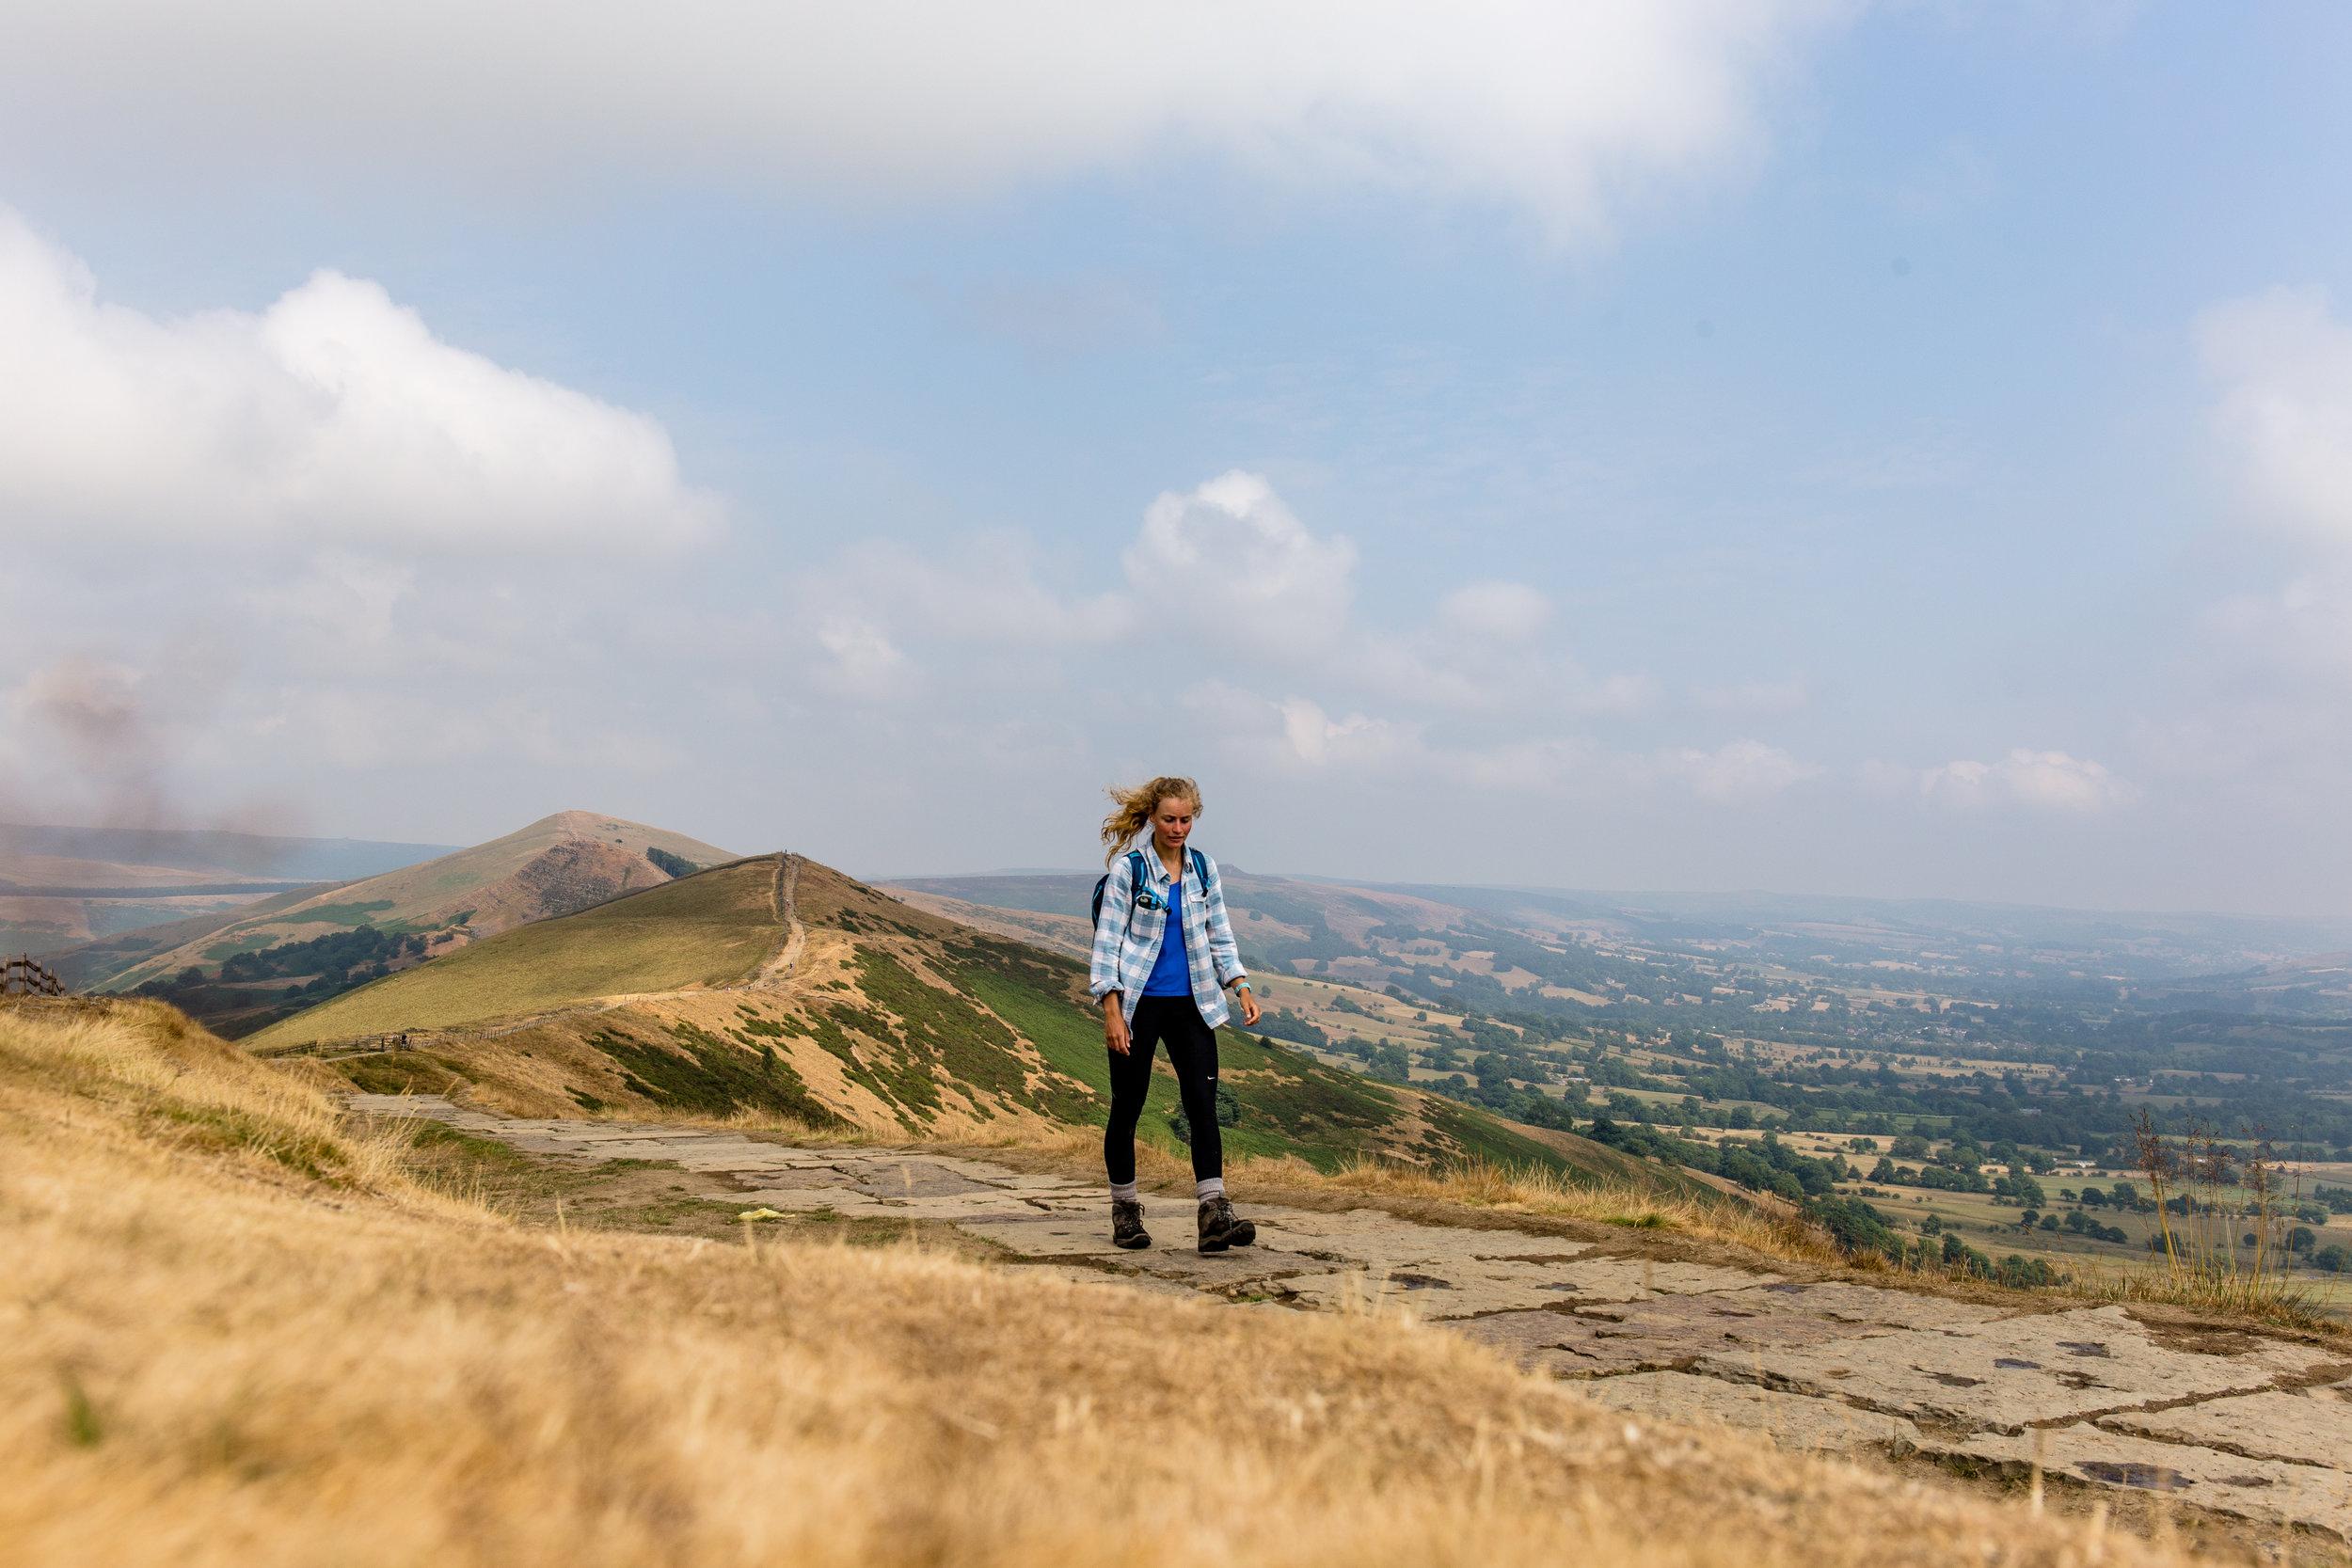 Hiking along the ridgeline